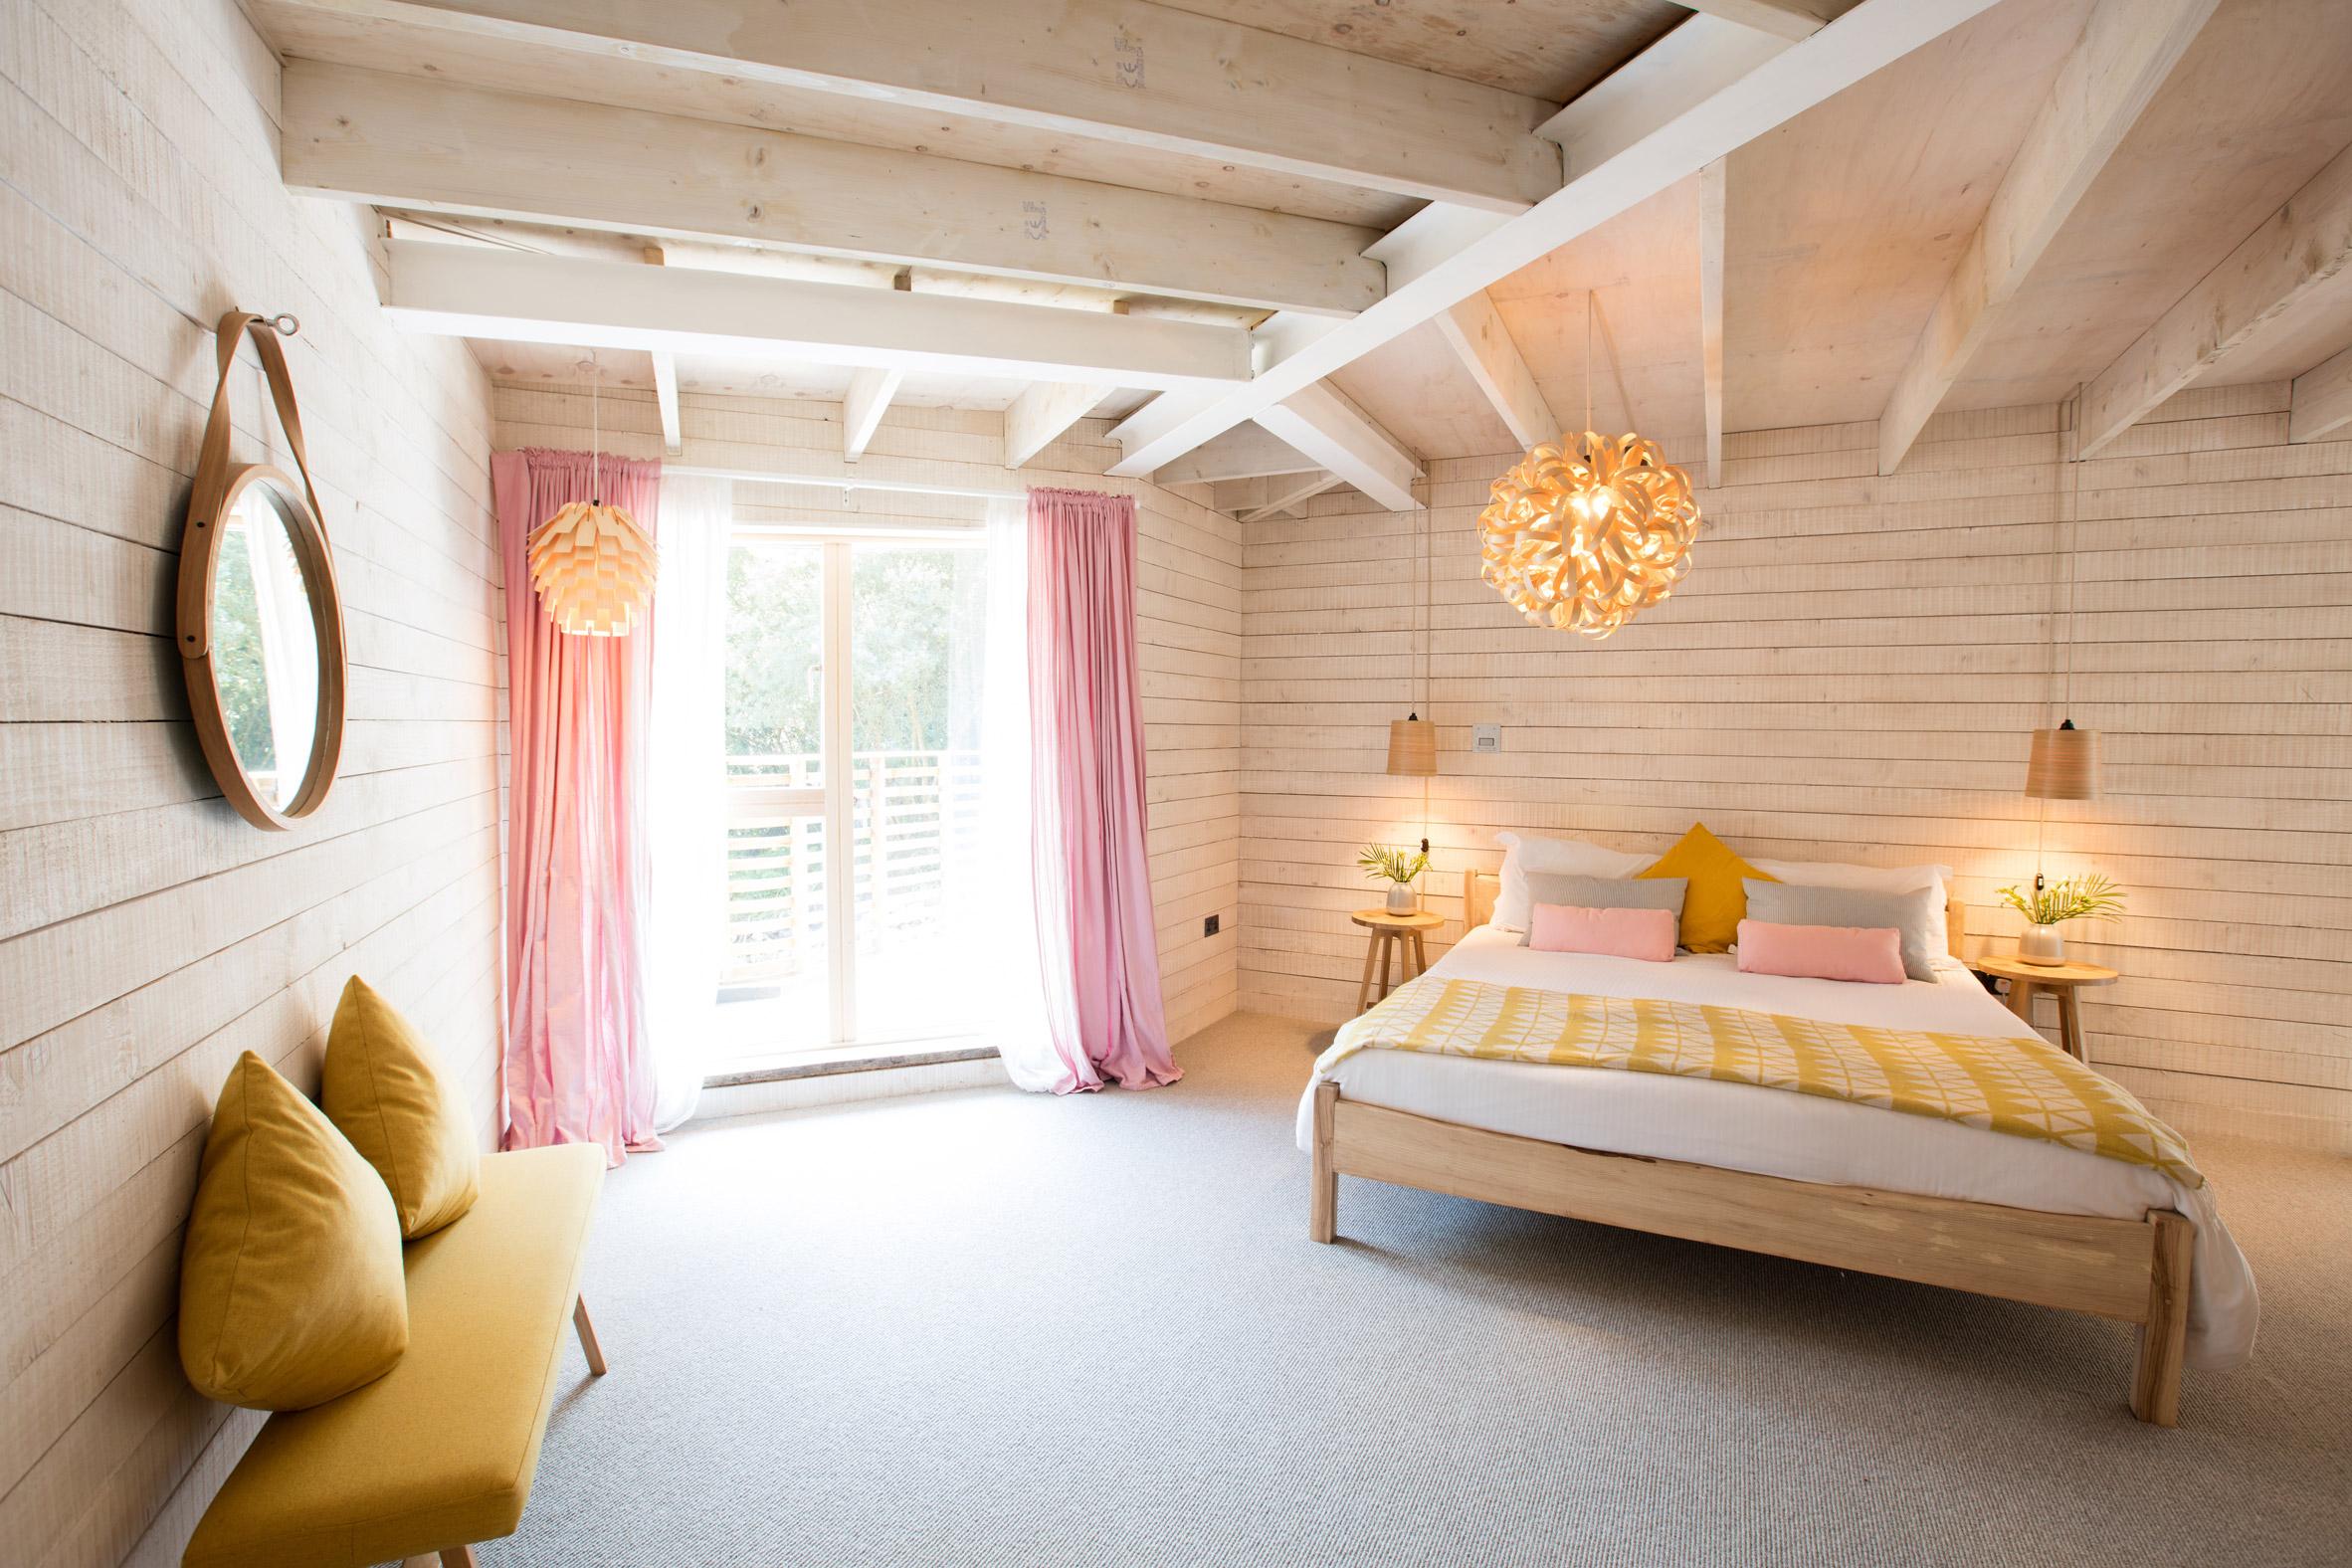 steam-bent-house-tom-raffield-architecture-residential_dezeen_2364_col_2.jpg